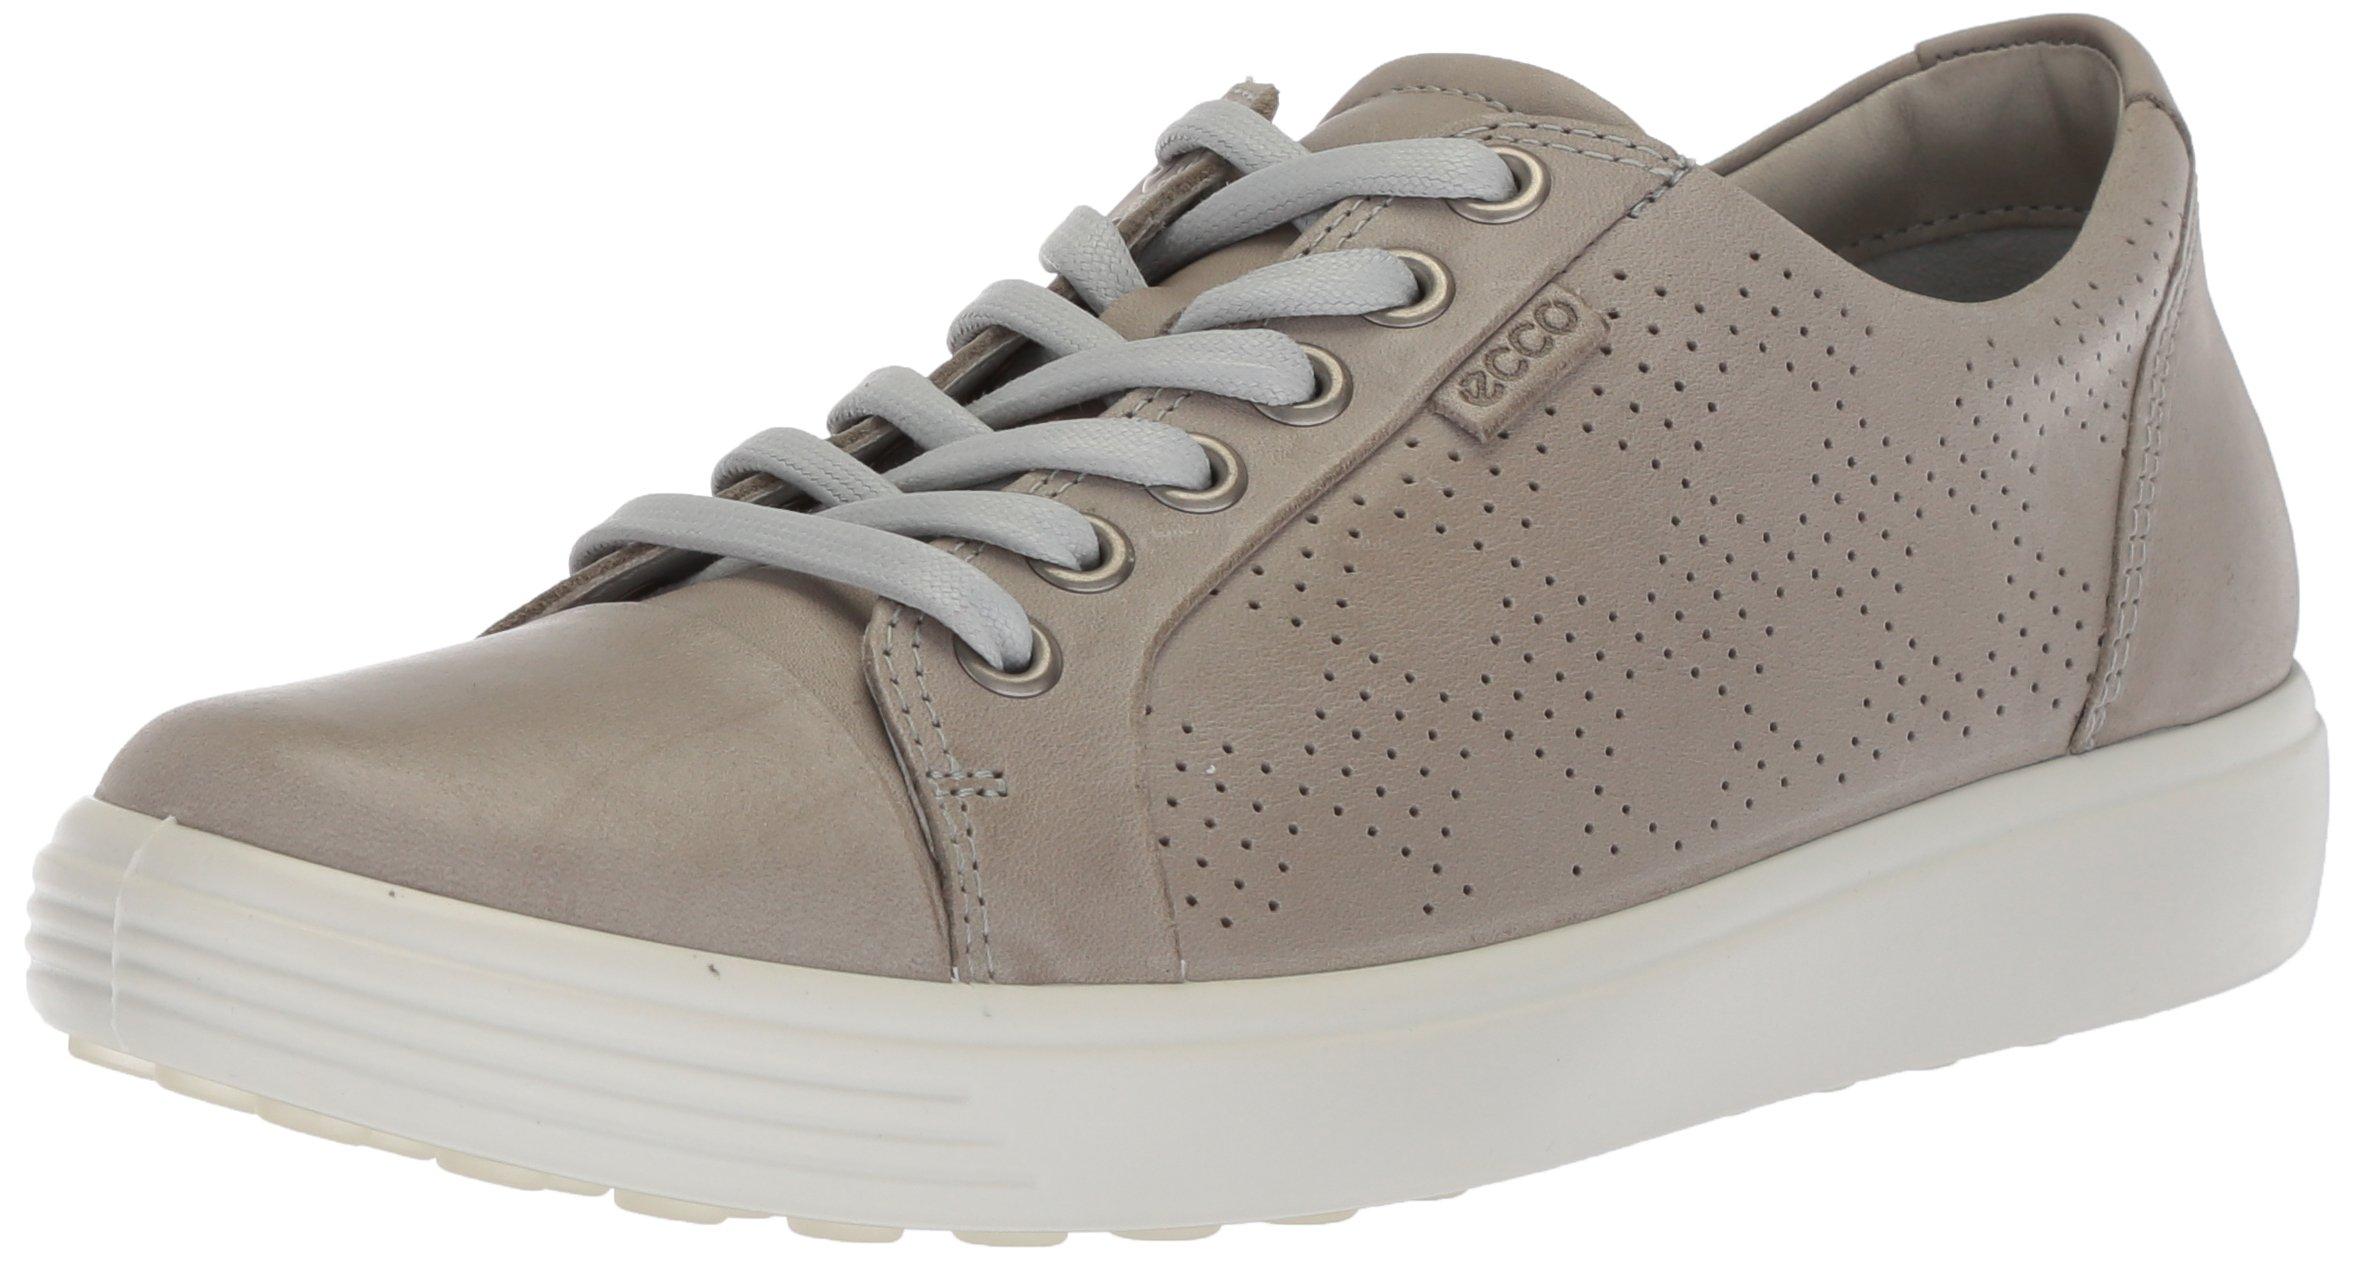 ECCO Women's Women's Soft 7 Fashion Sneaker, Wild Dove Perforated, 40 M EU (9-9.5 US)